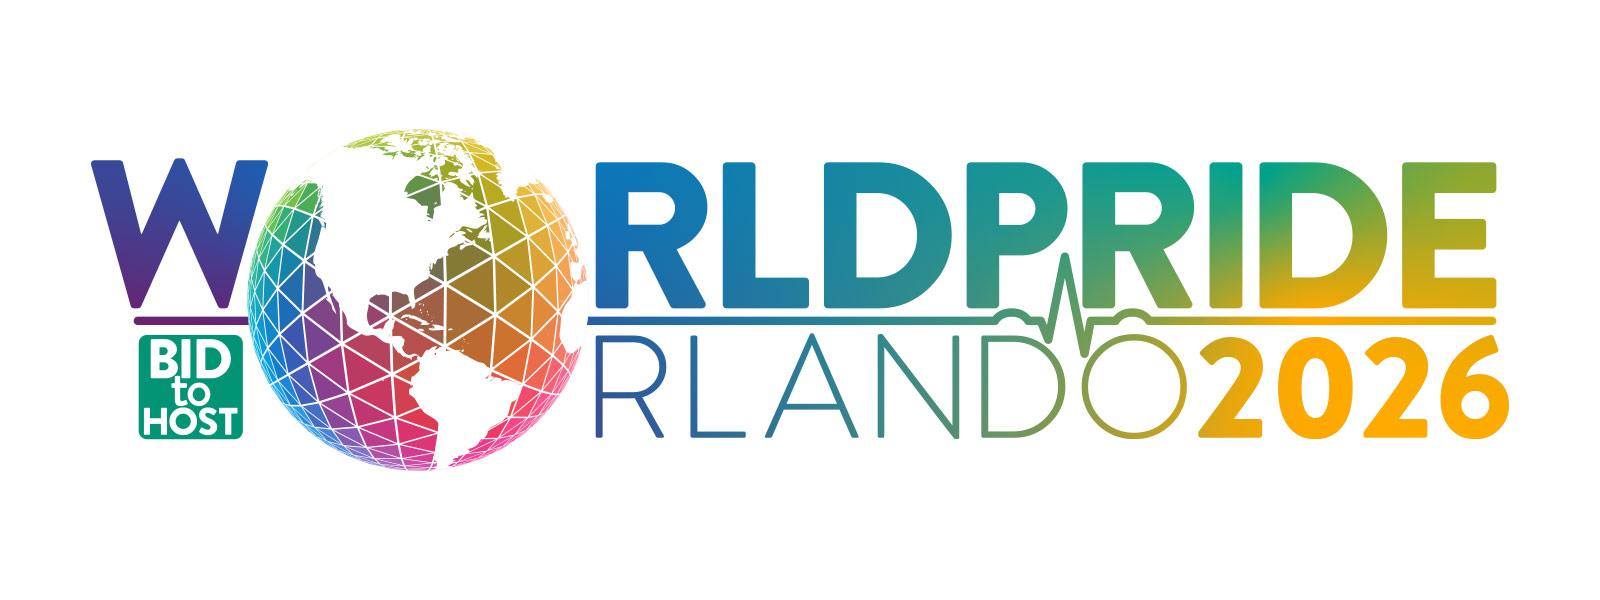 Bid to Host WorldPride Orlando 2026